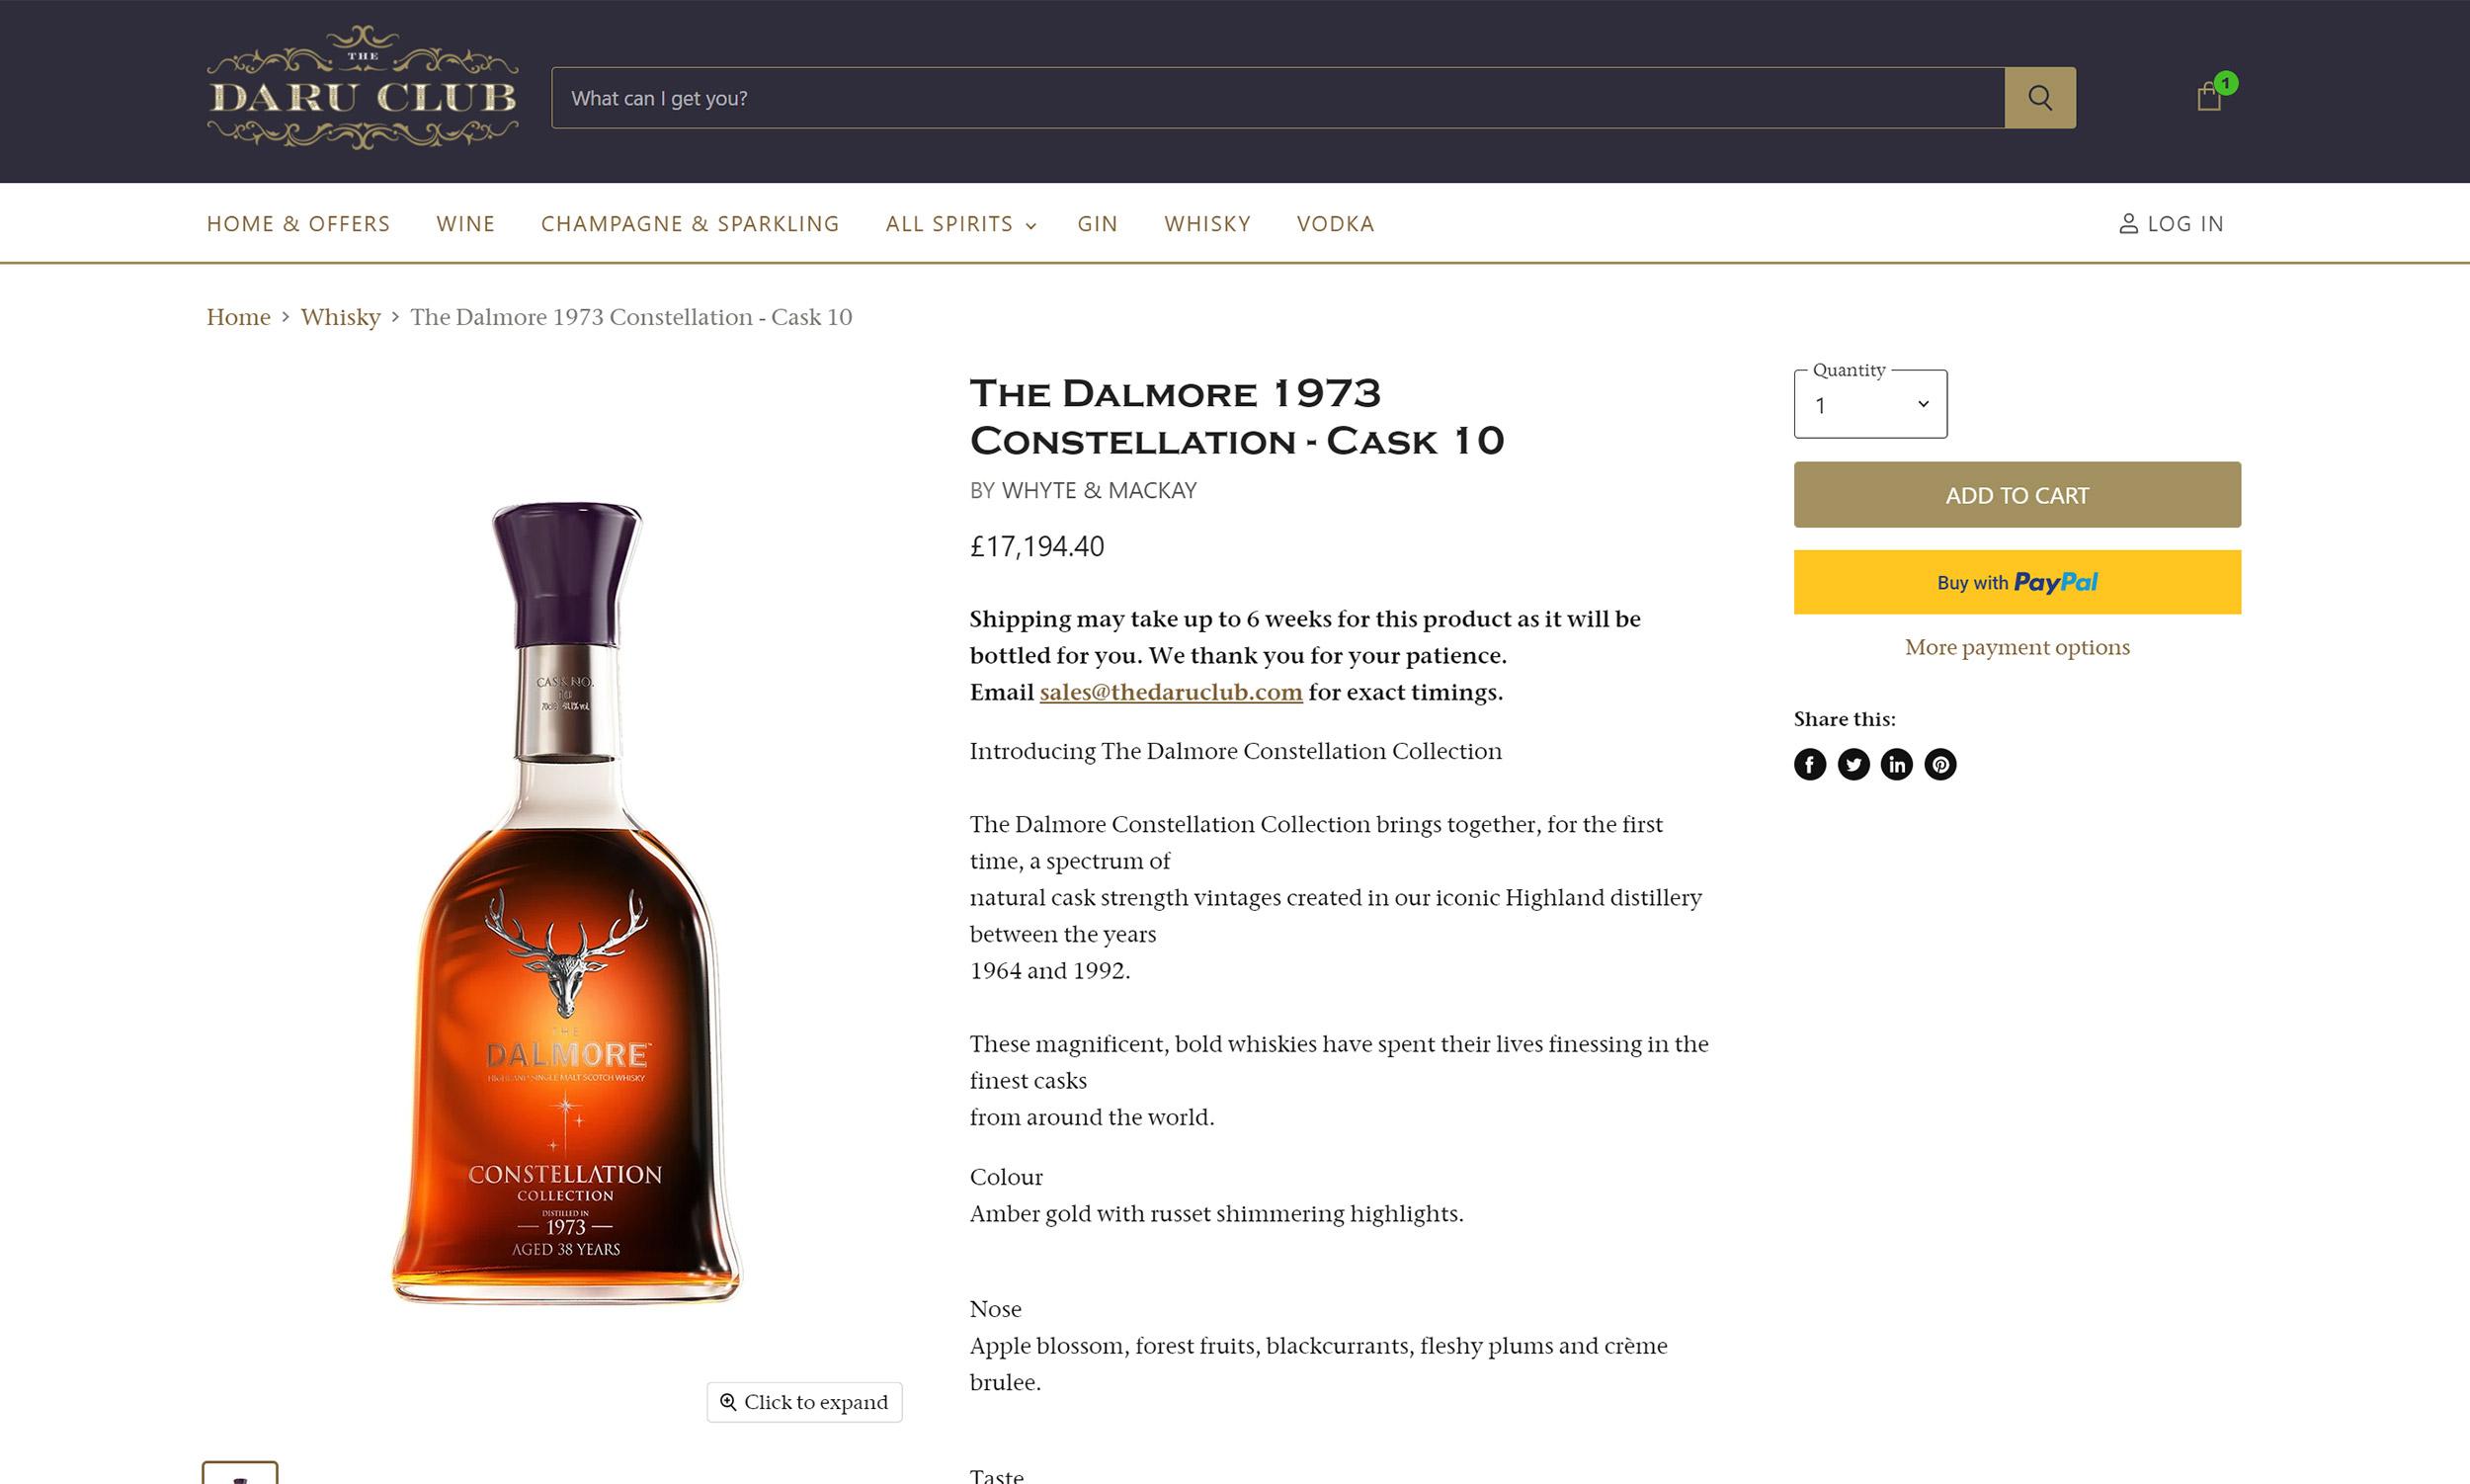 ecommerce-website-design-daru4-farnborough-DGTL